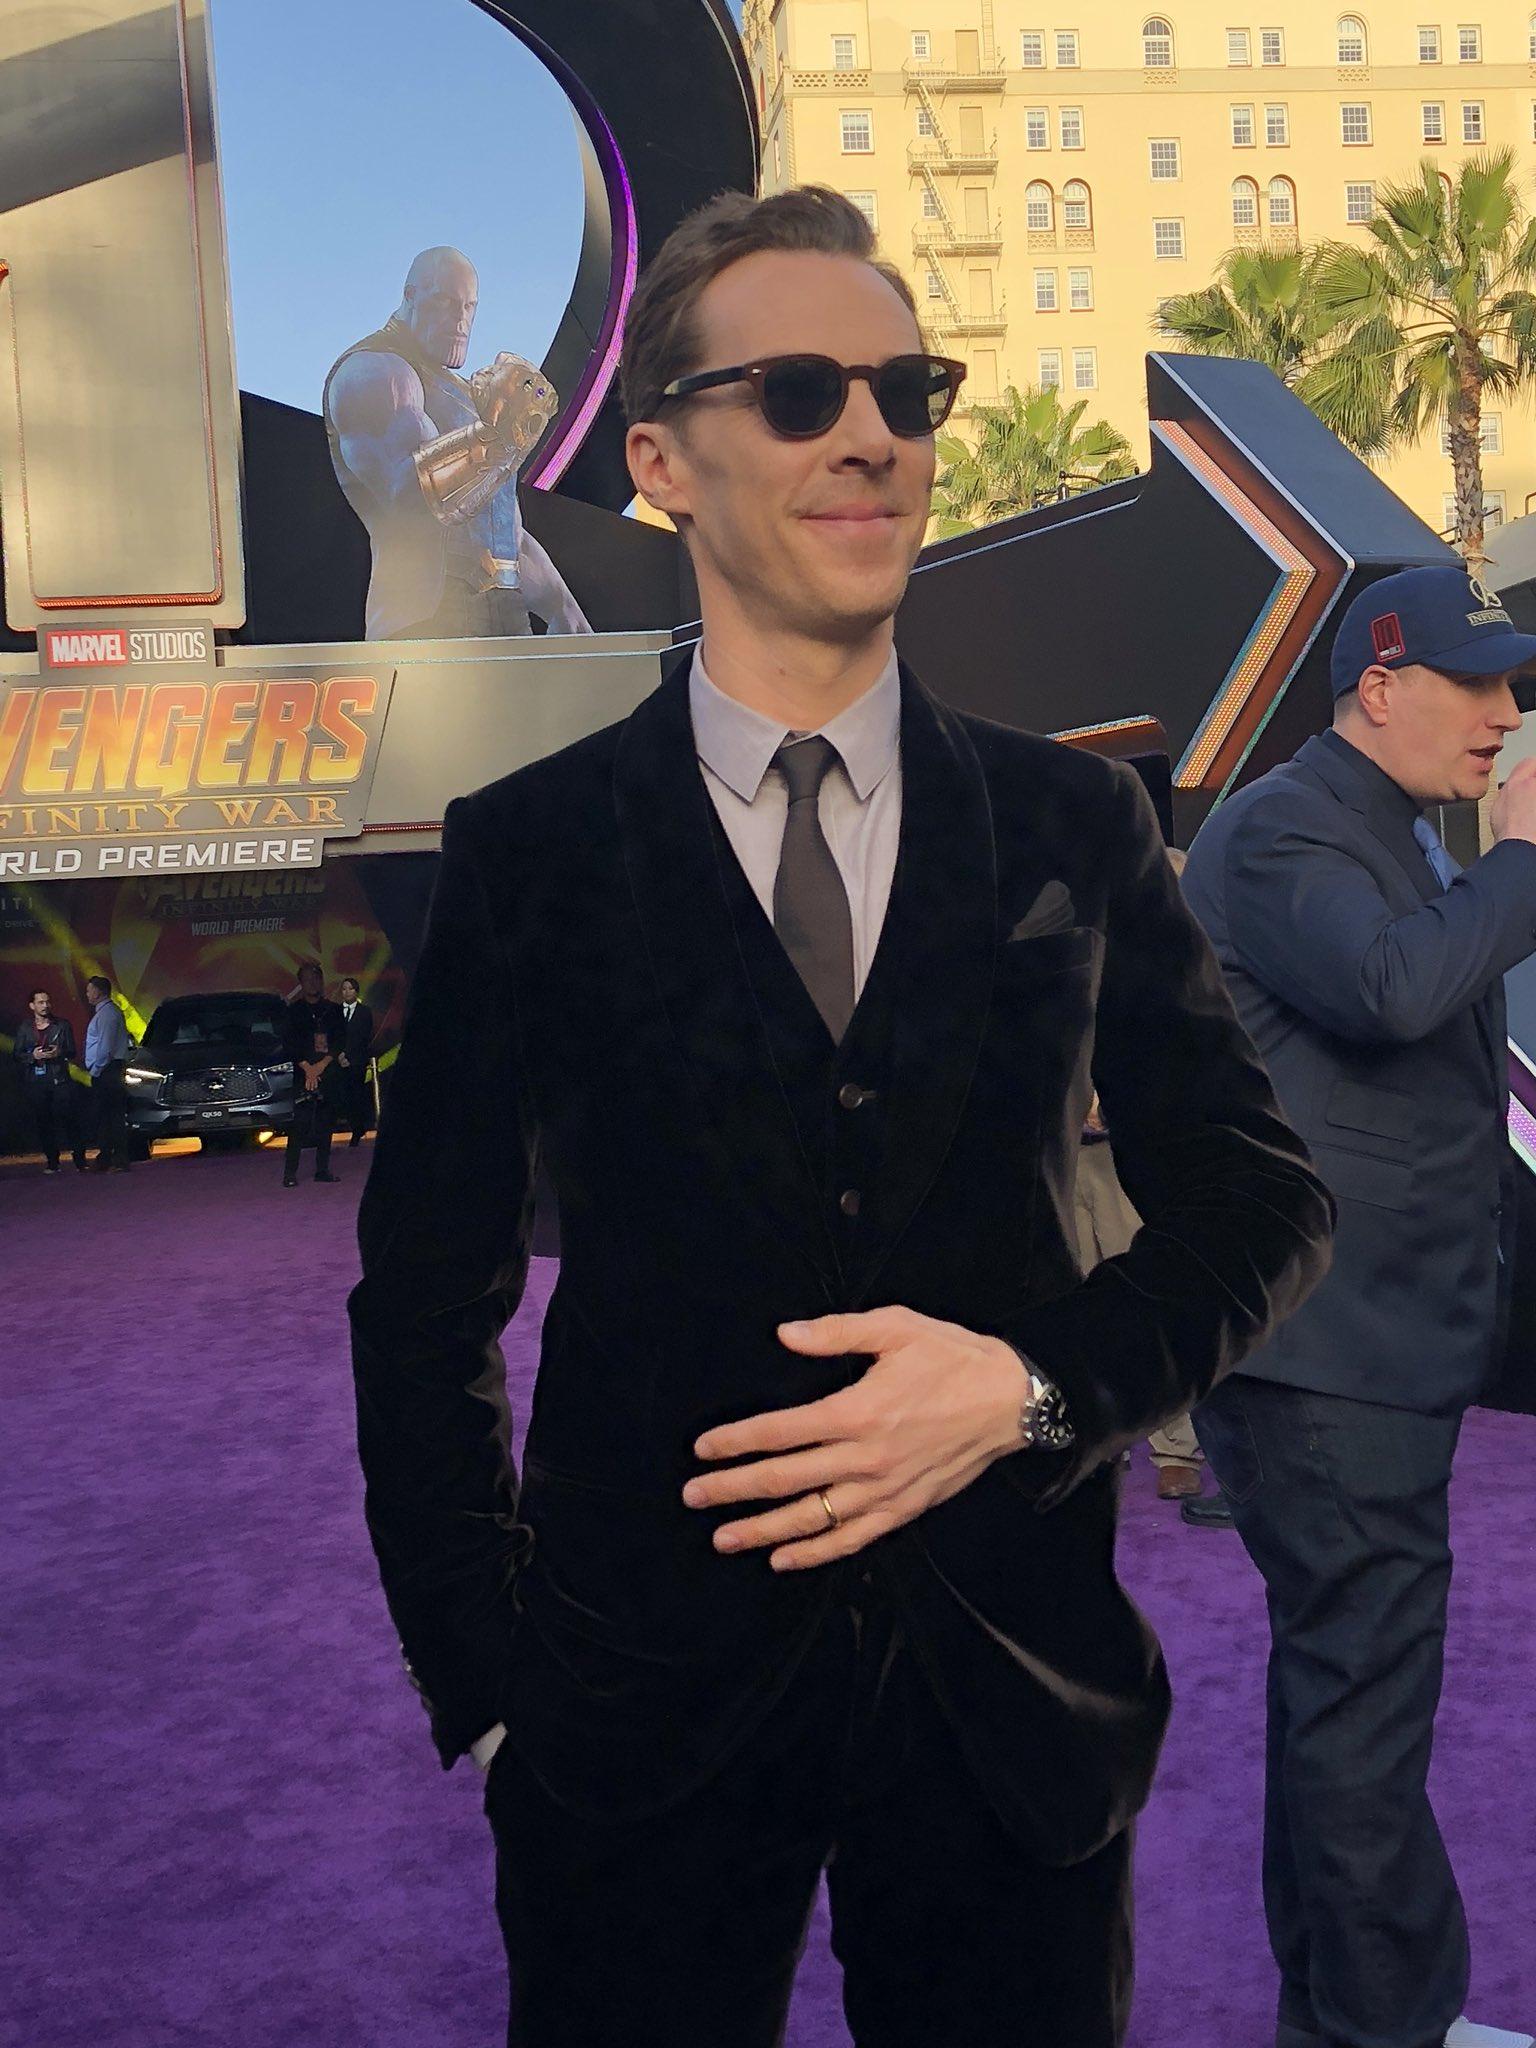 Benedict Cumberbatch - Doctor Strange himself - is always a good time! #InfinityWar https://t.co/gCyVf7trDu